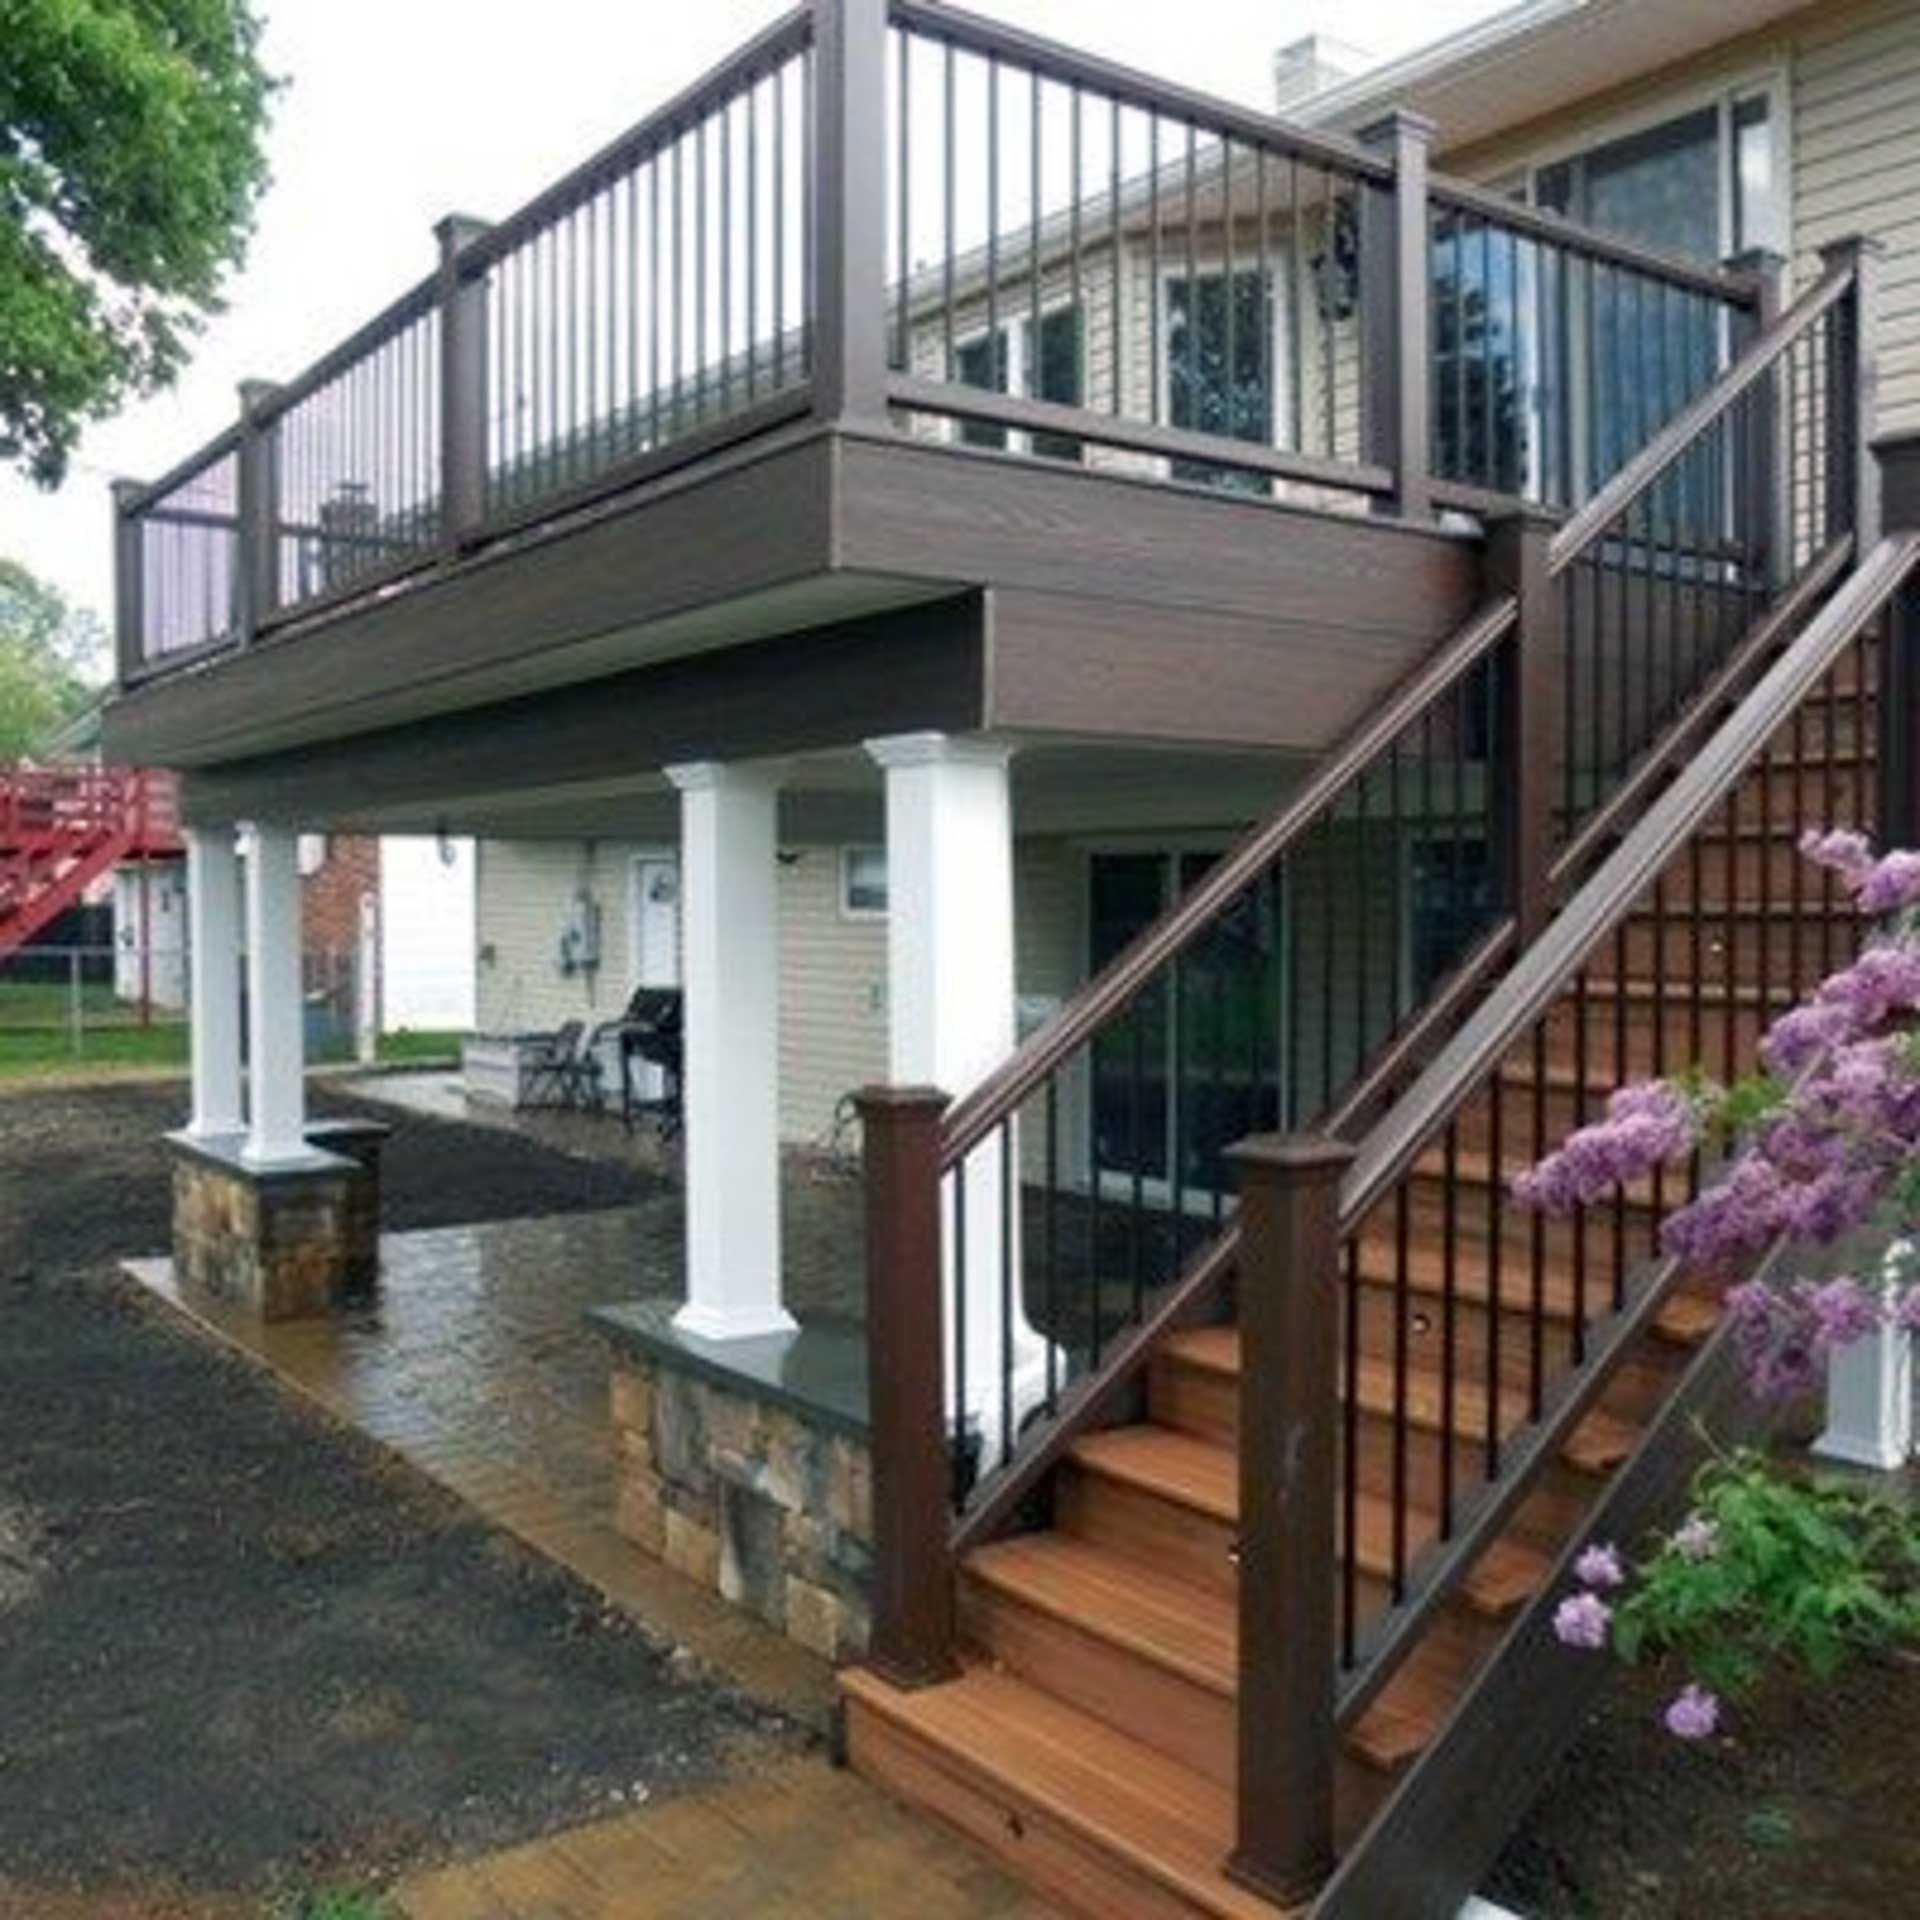 21 Beautiful 2nd Floor Deck Ideas Patio Deck Designs Deck Design Porch Design